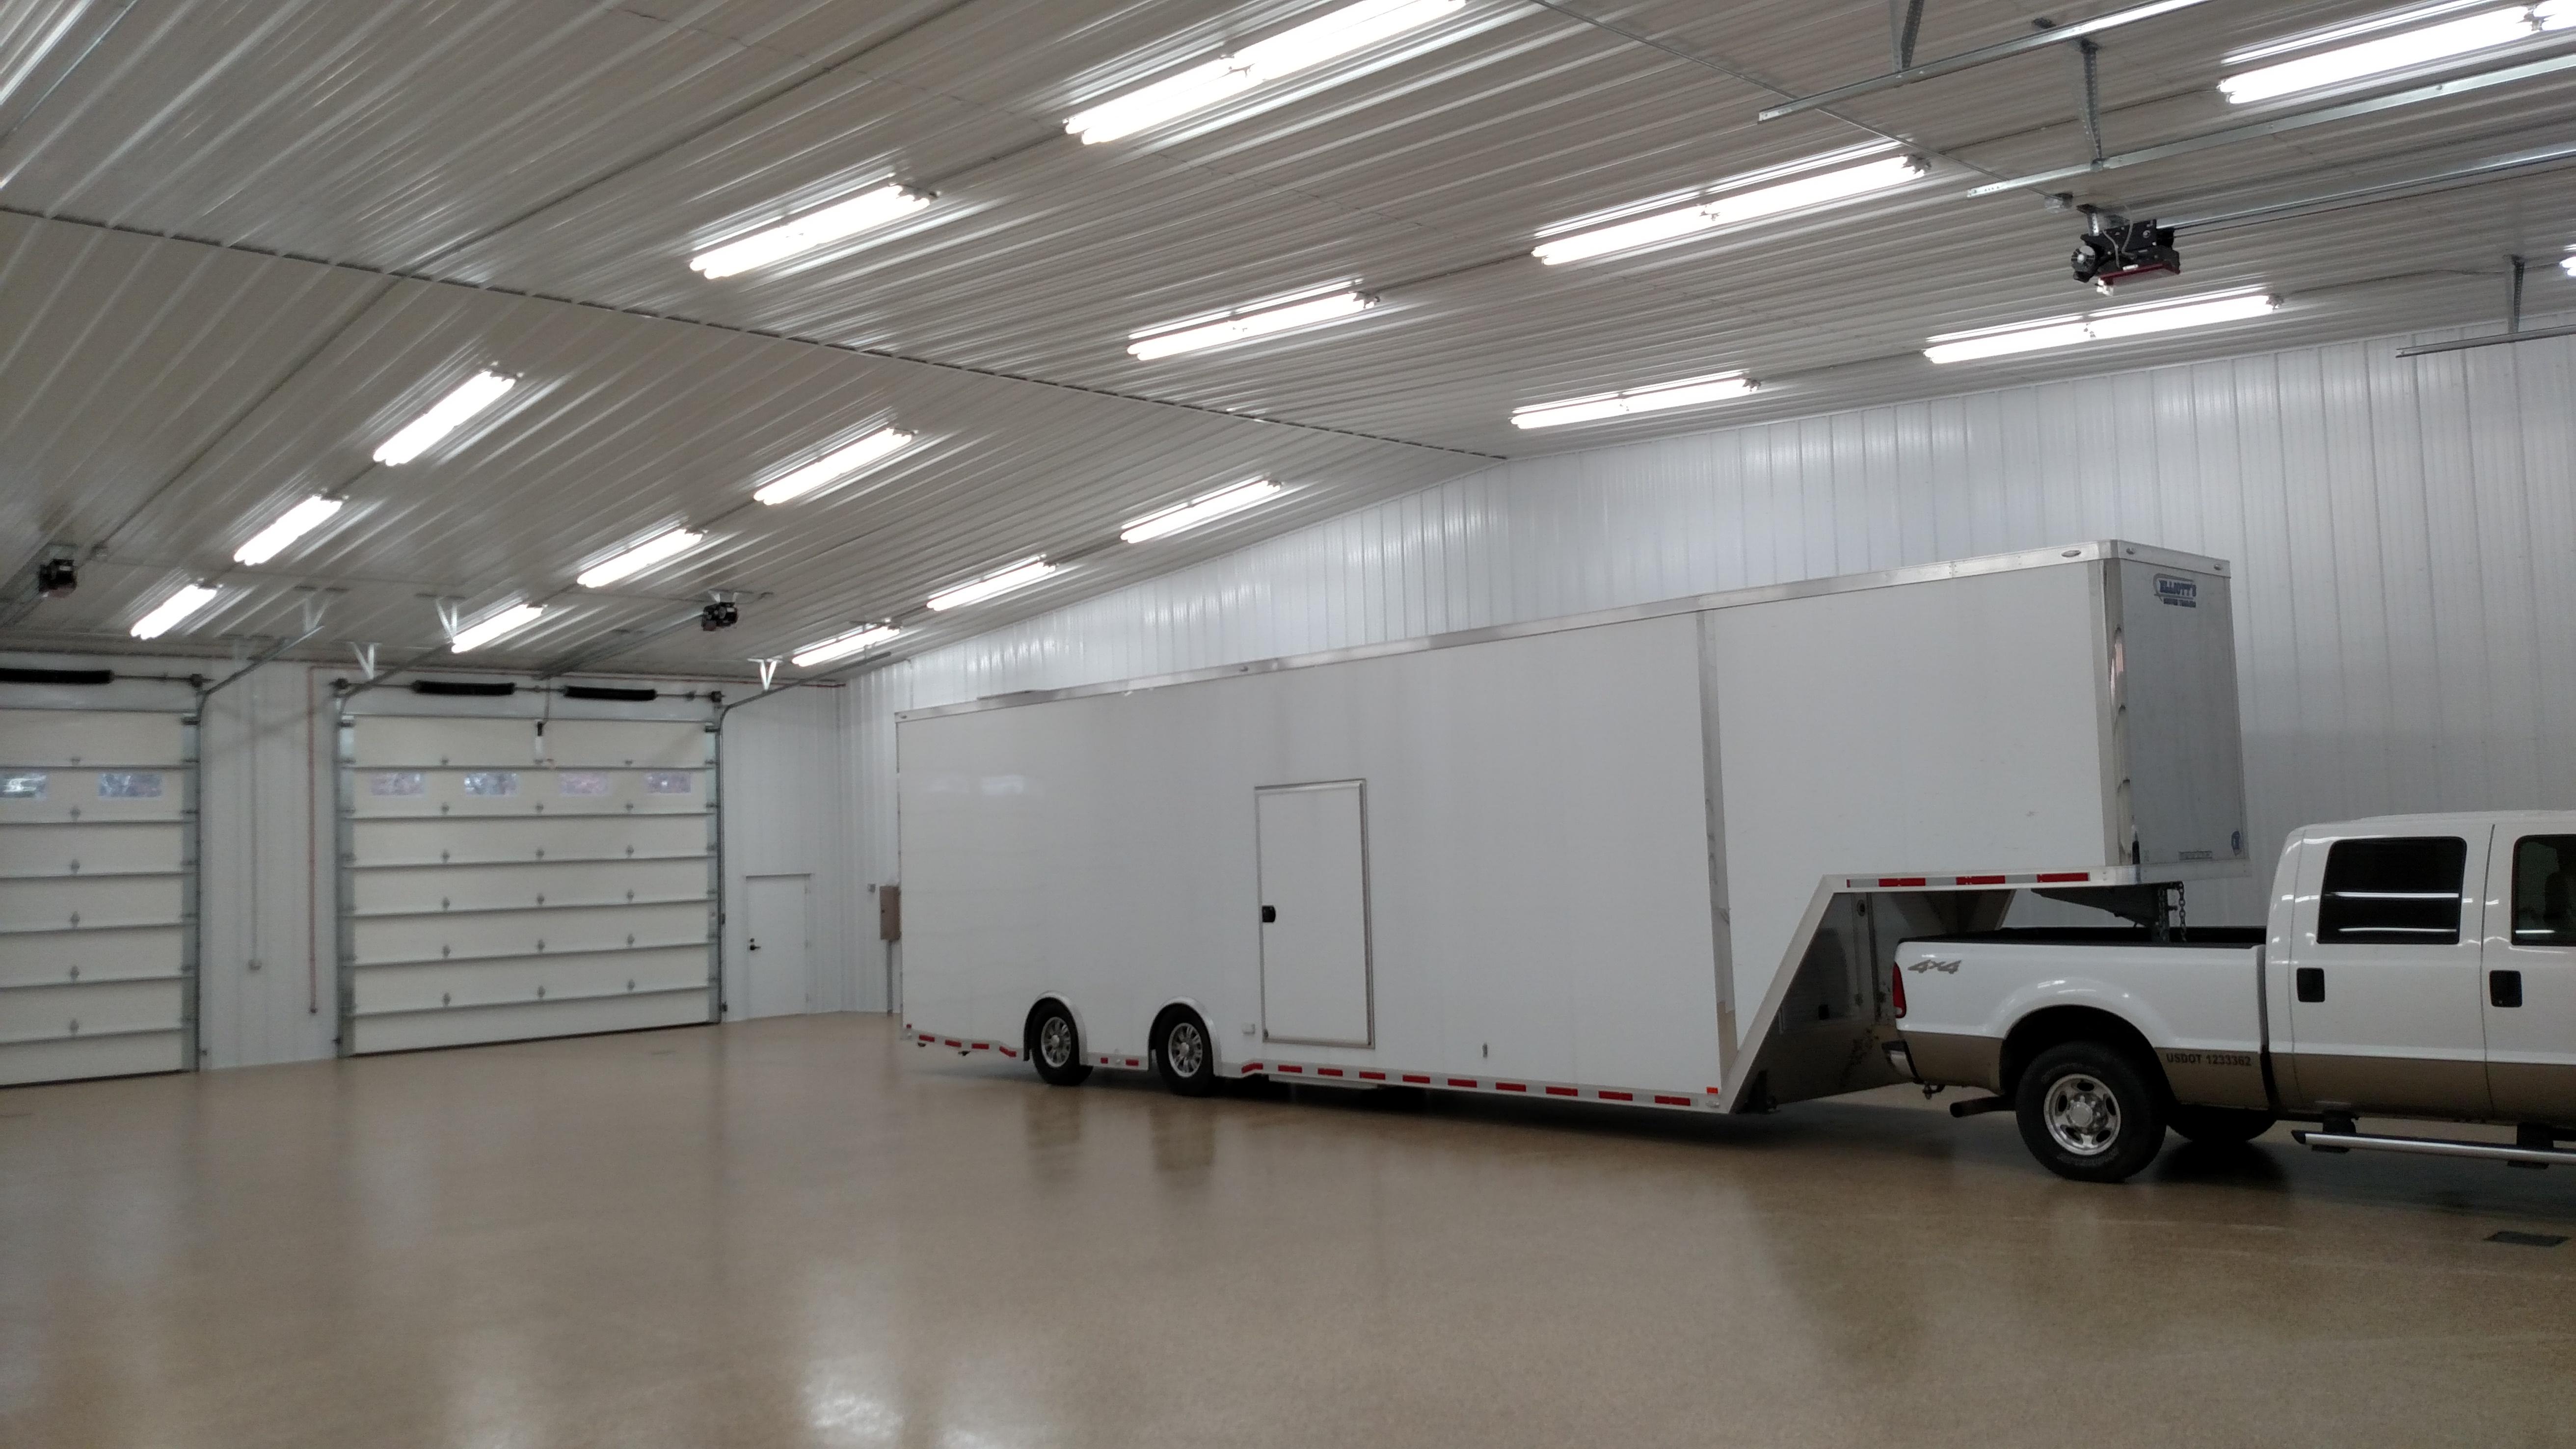 Garages Gallery - Garage Solution Condominiums